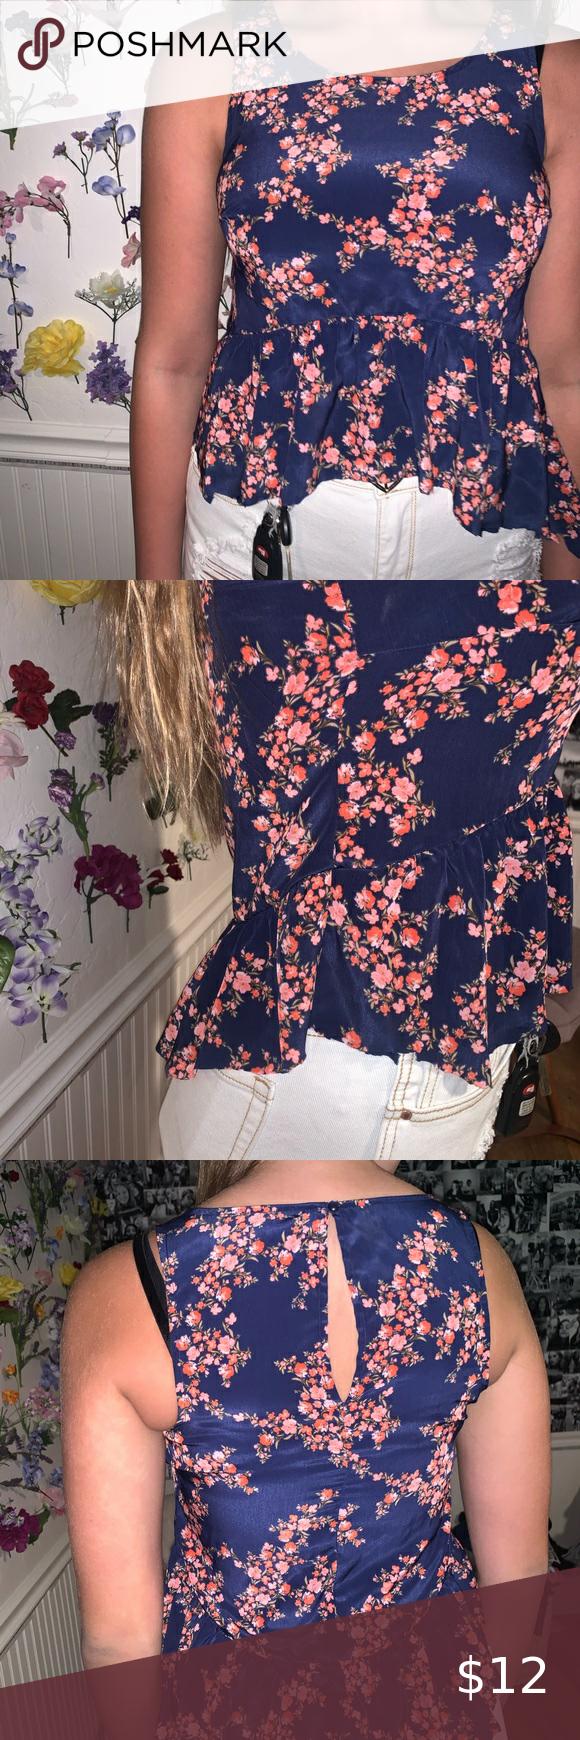 Photo of Tank top Floral, tank top, little ruffle on bottom, navy blu…